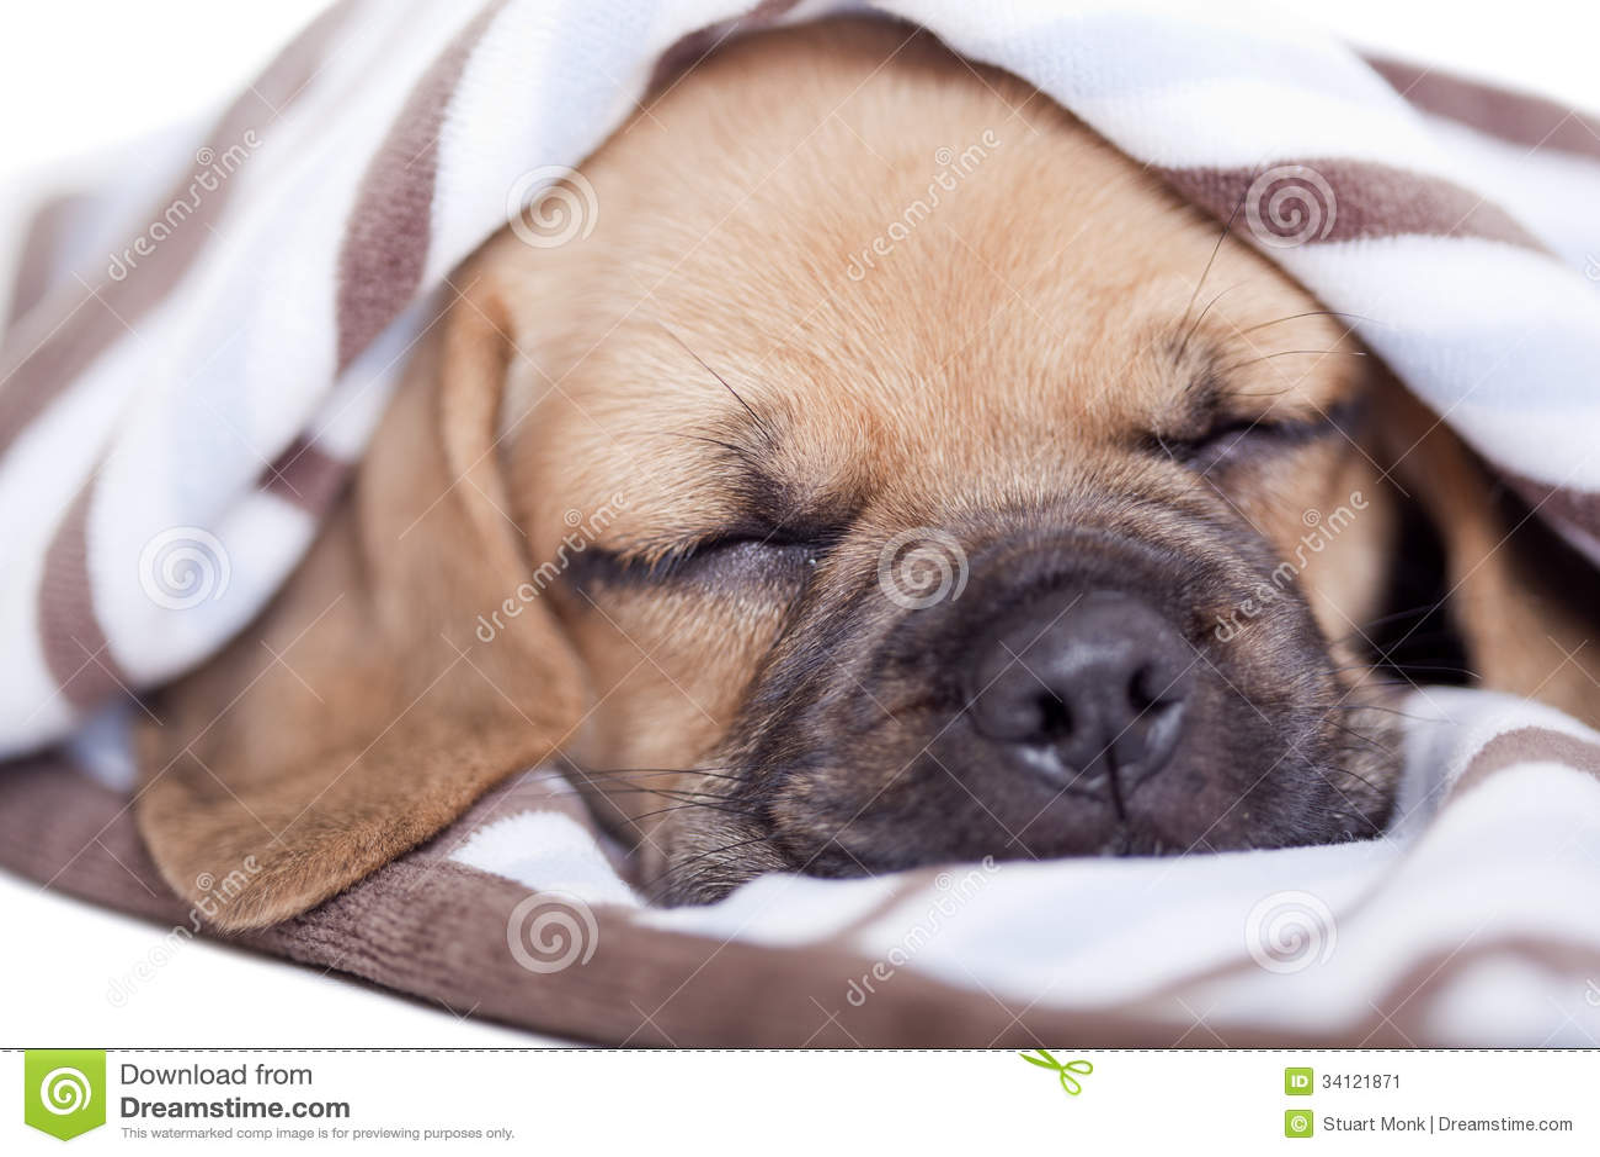 Puppy Stock Image - Image: 34121871  White